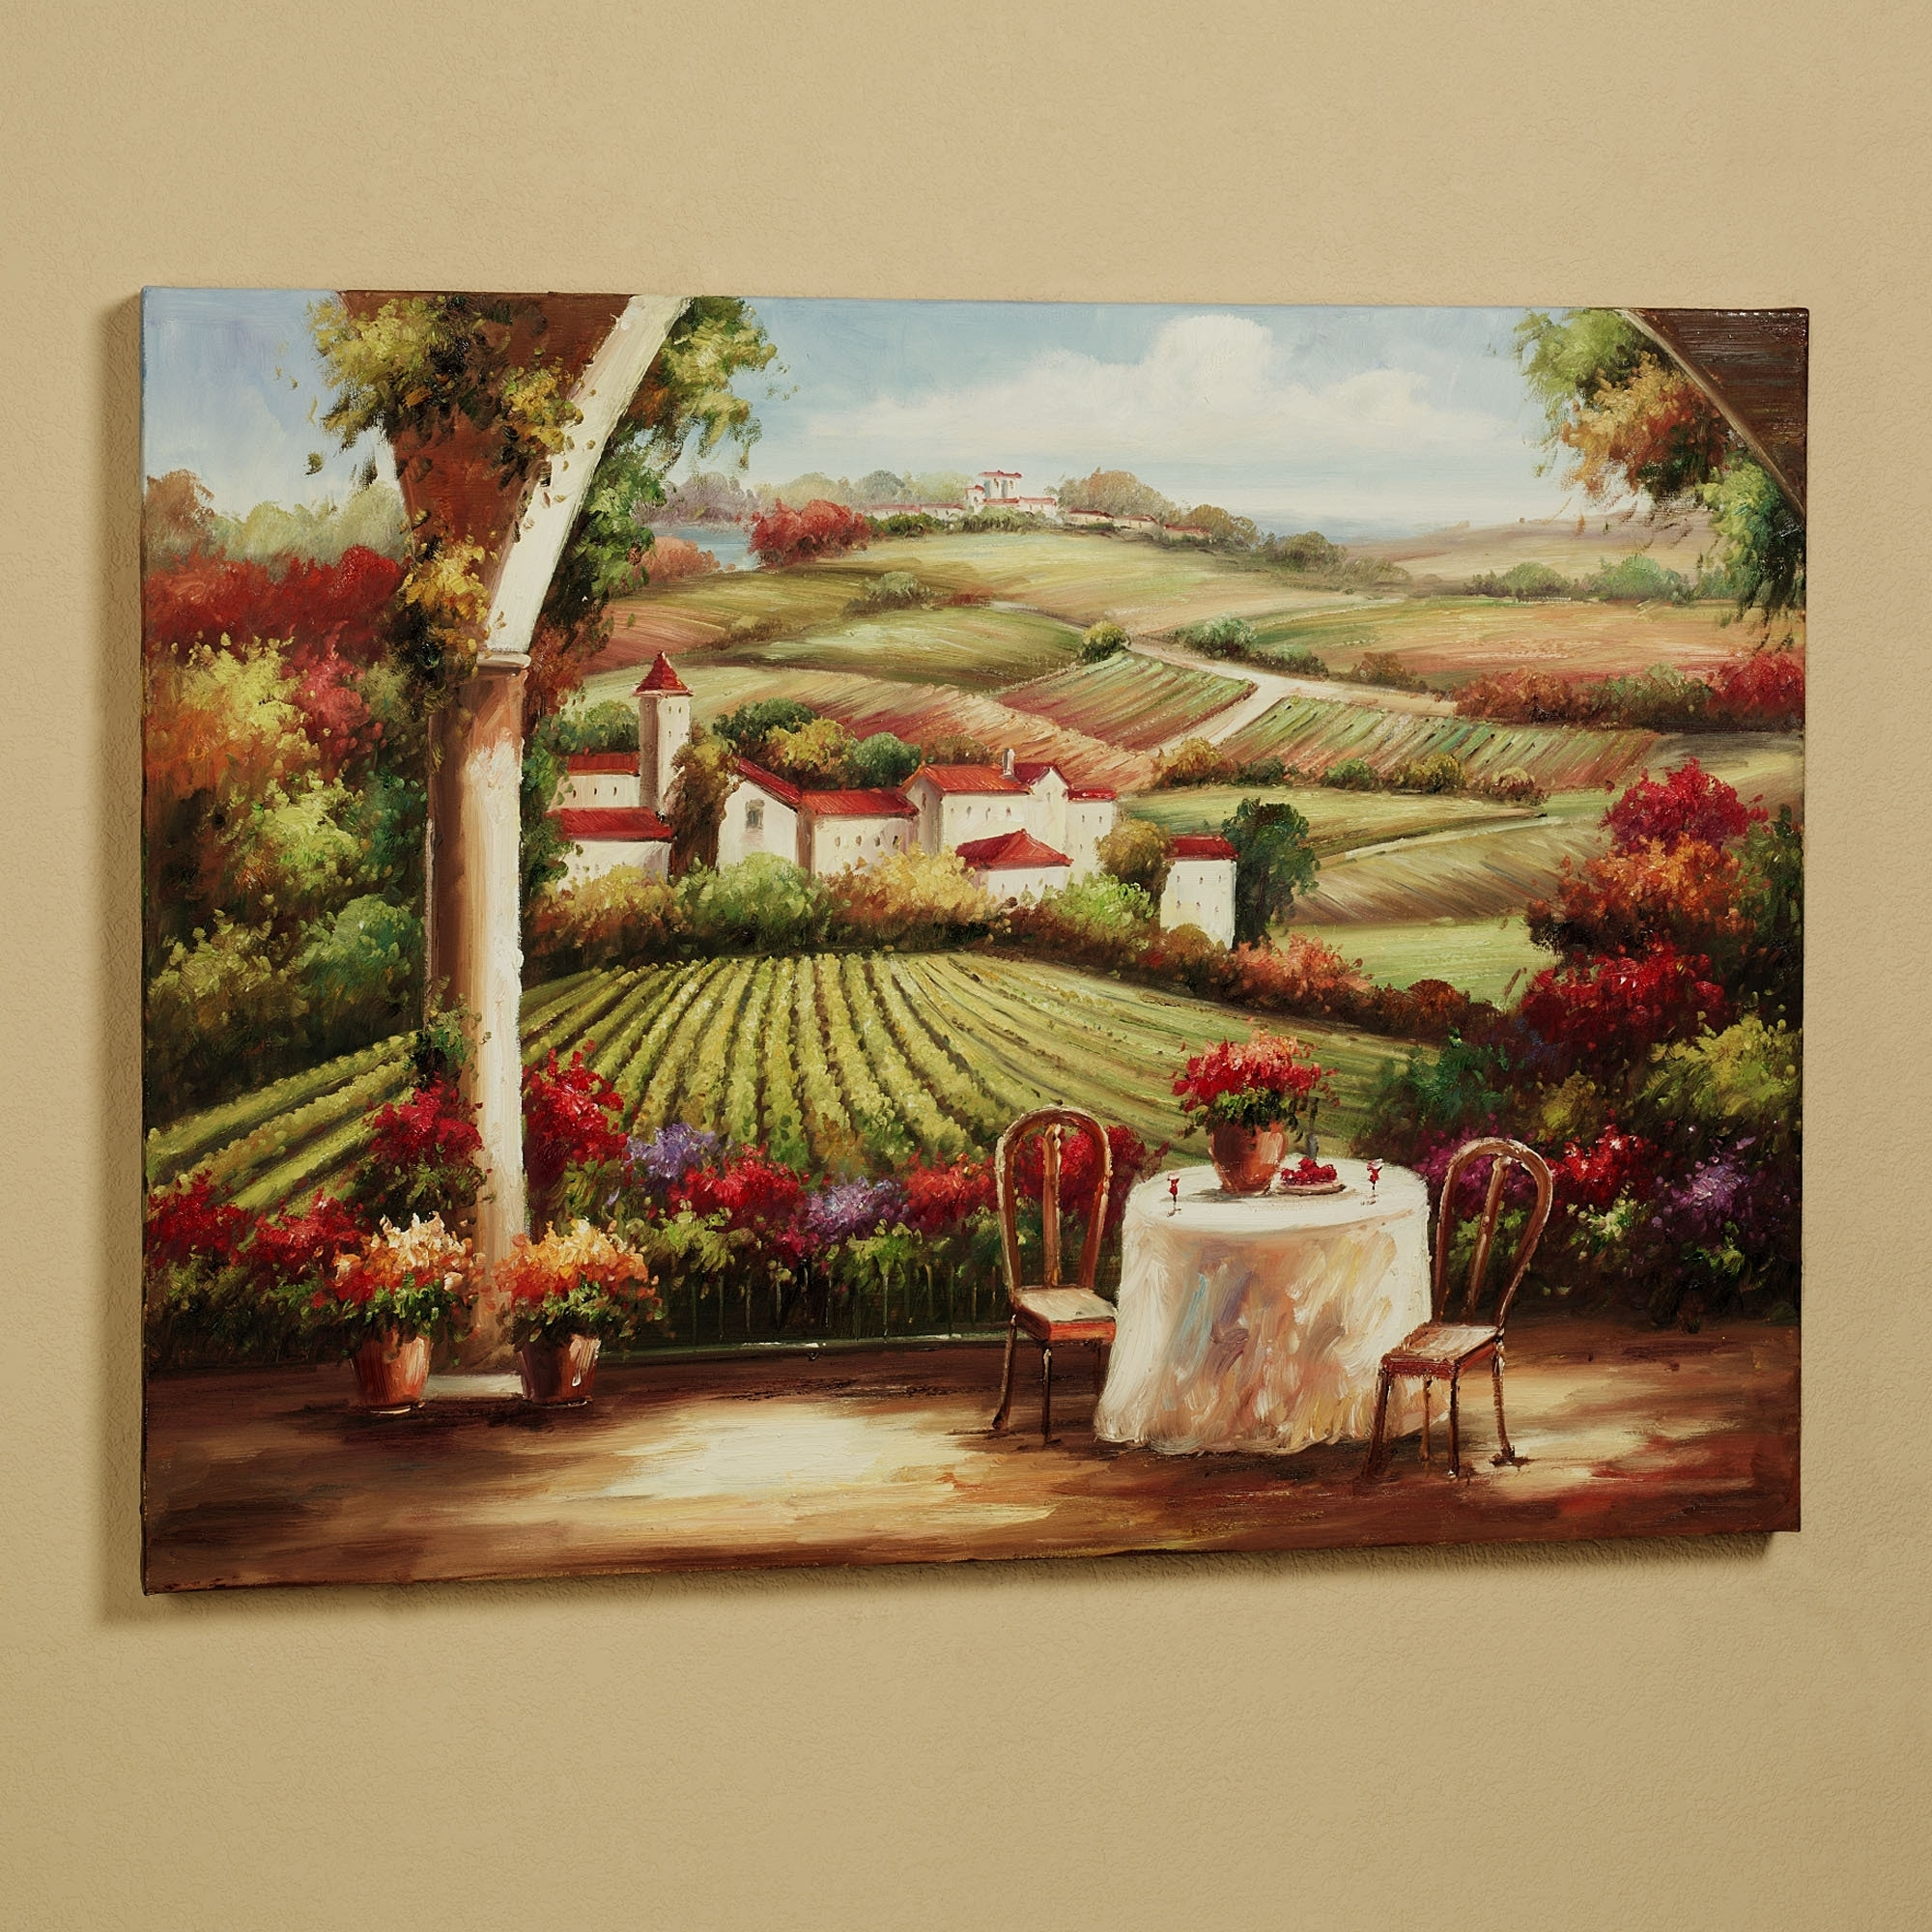 Newest Cheap Italian Wall Art In Wall Art Designs: Terrific Vineyard Wall Art Wine Decor Kitchen (View 10 of 15)